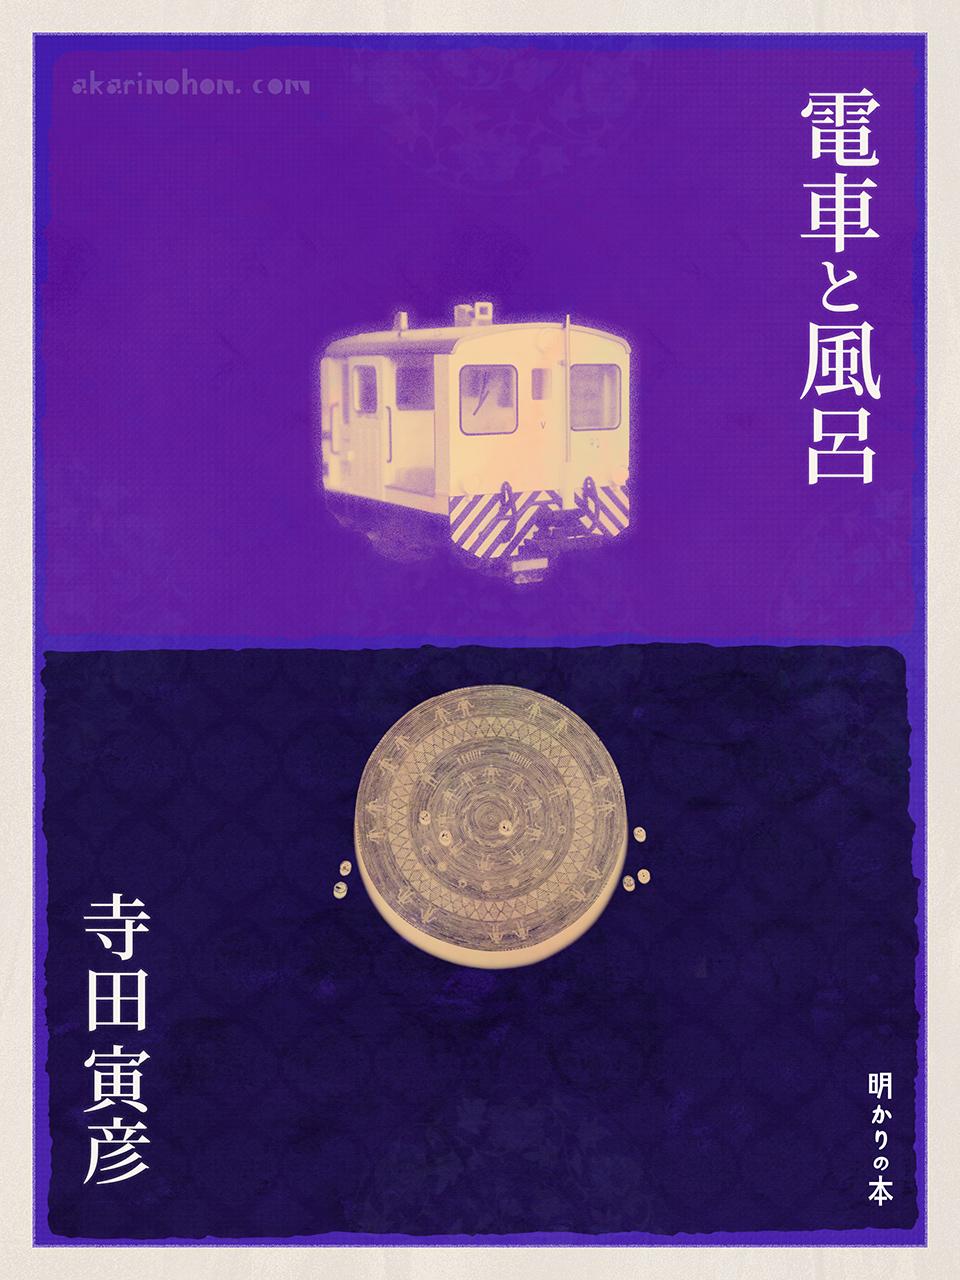 0000 - 電車と風呂 寺田寅彦